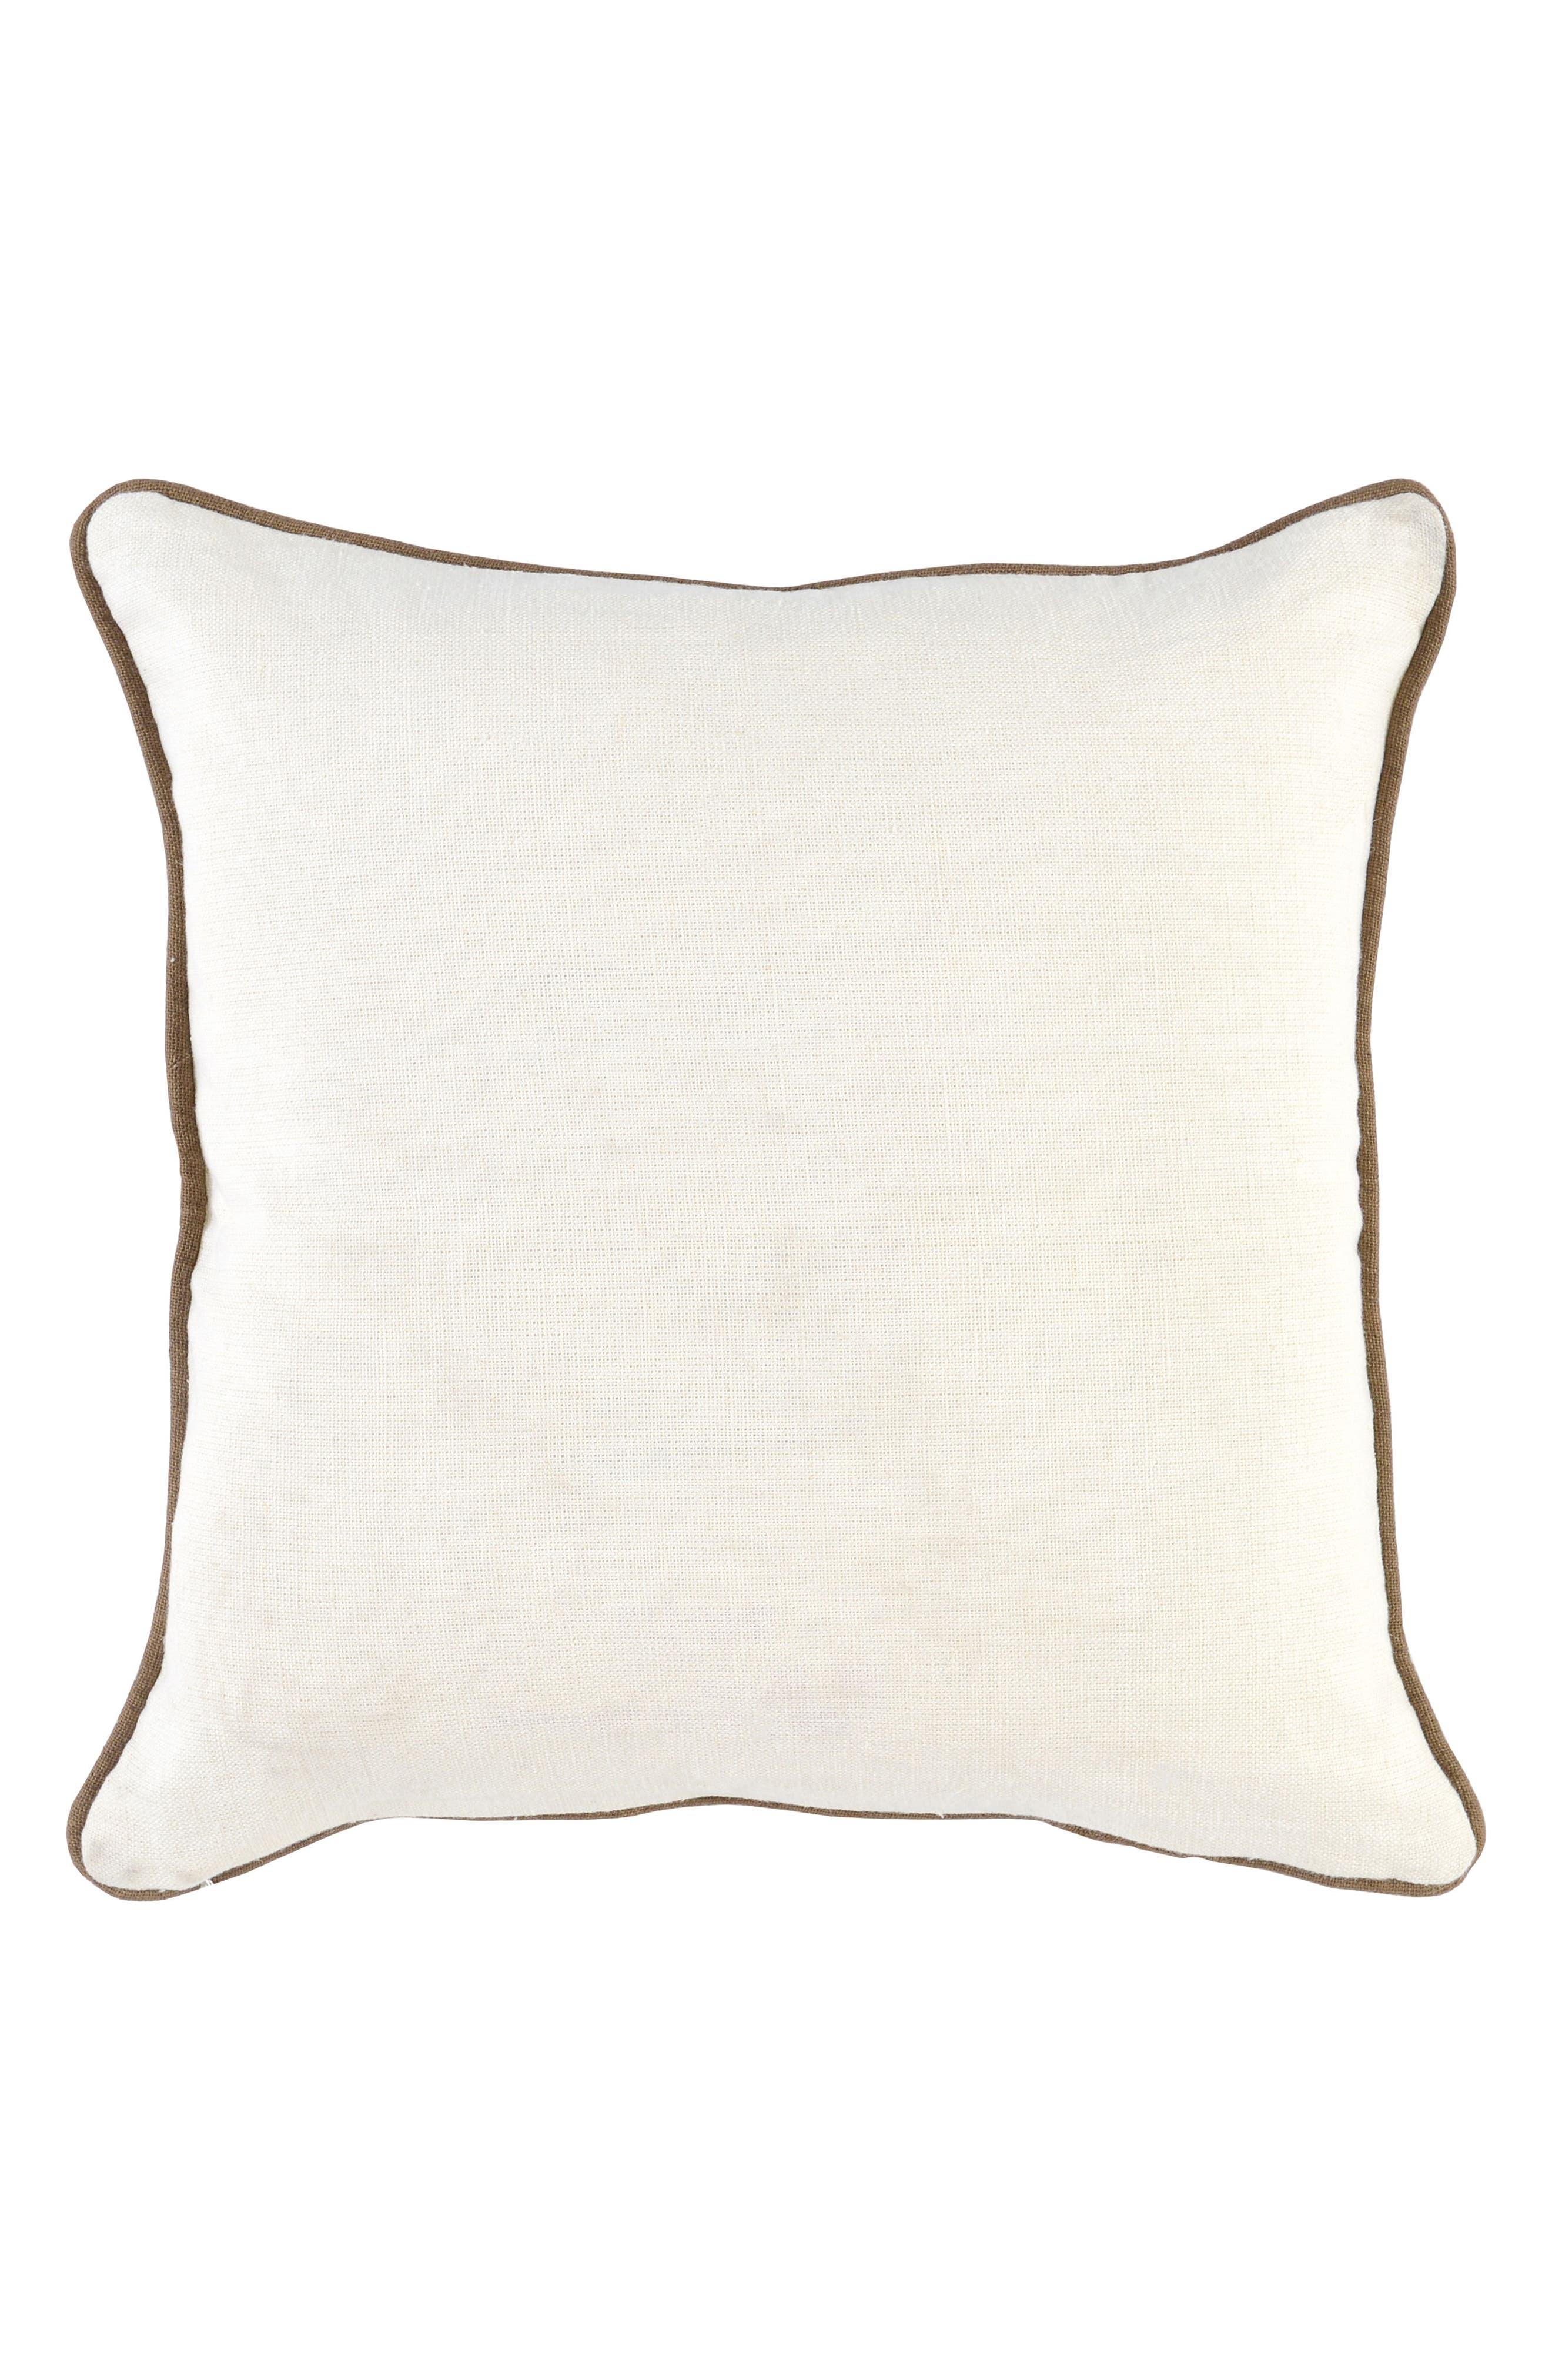 Sundew Accent Pillow,                             Alternate thumbnail 2, color,                             GOLD